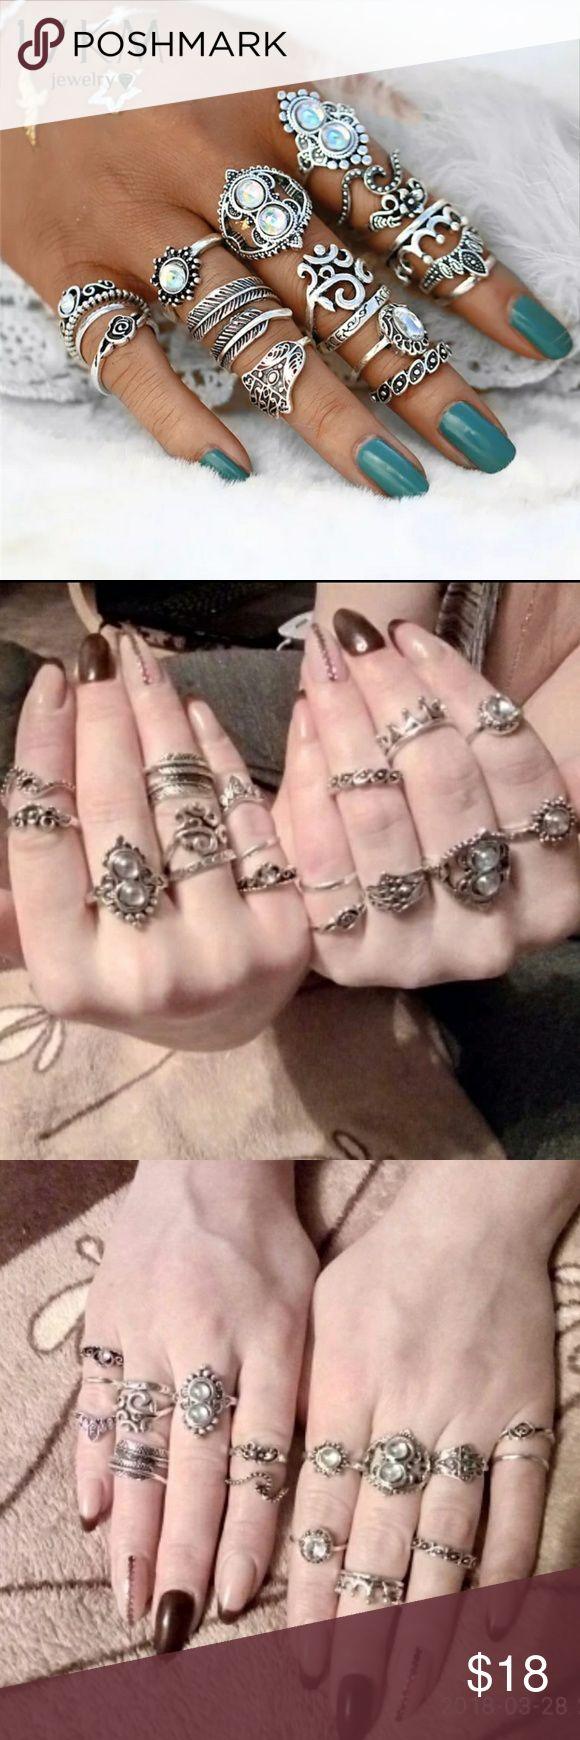 Best 9 Ring images on Pinterest   Diamond jewellery, Diamond jewelry ...